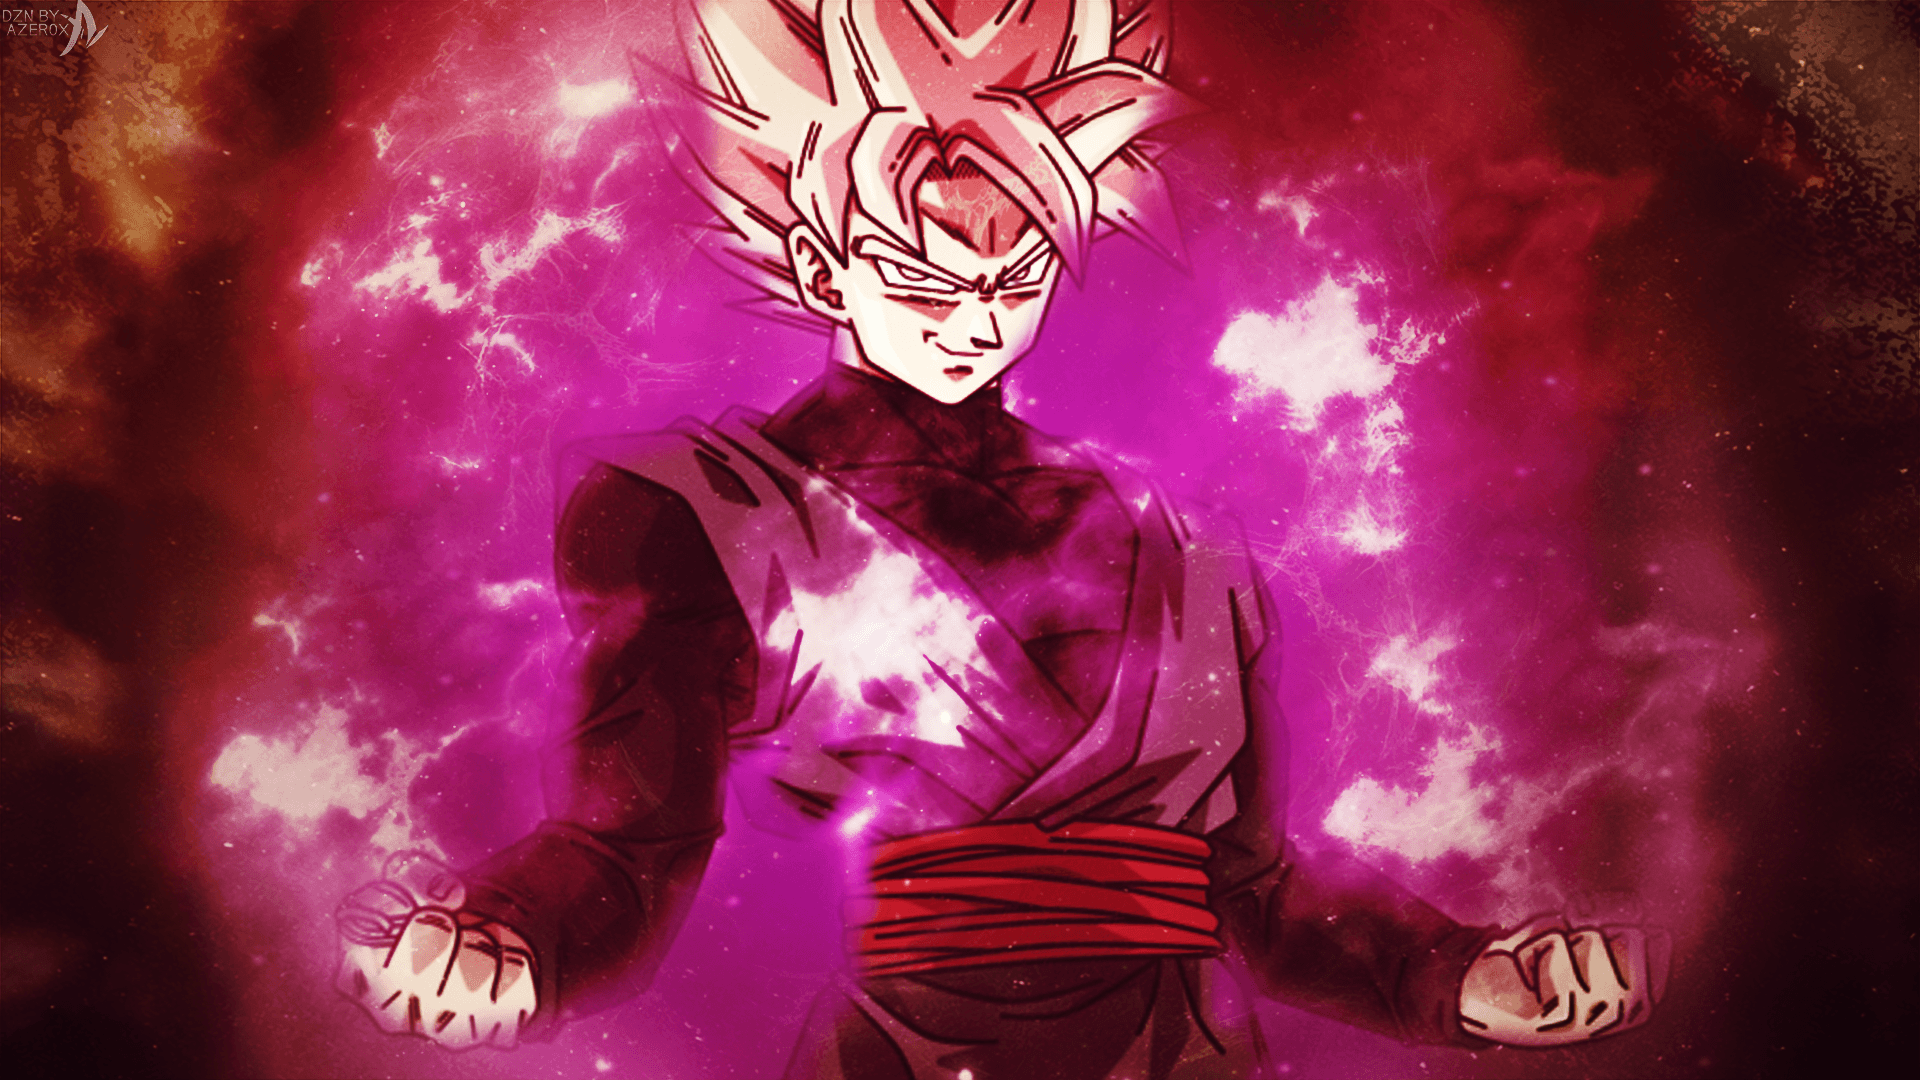 Black Goku Db Super Wallpapers Top Free Black Goku Db Super Backgrounds Wallpaperaccess